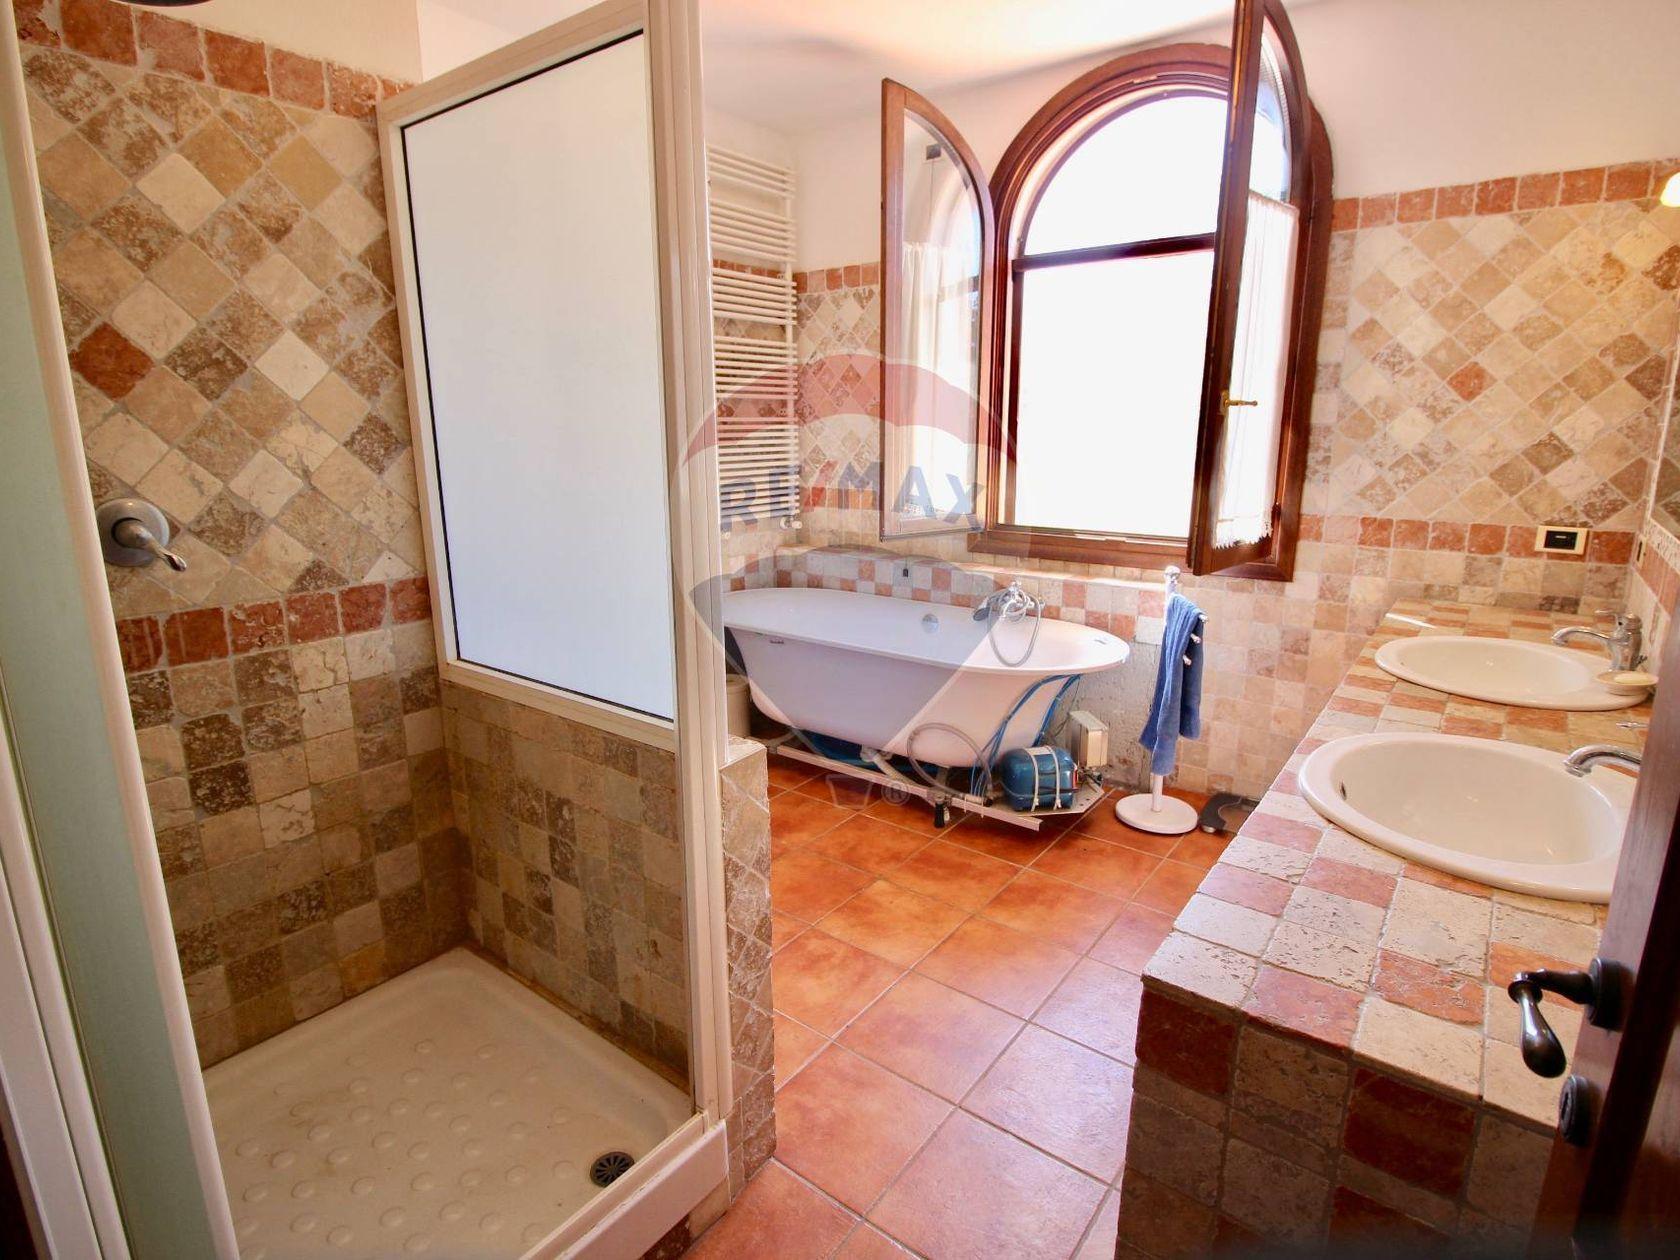 Villa singola Ss-filgheddu, Sassari, SS Vendita - Foto 19